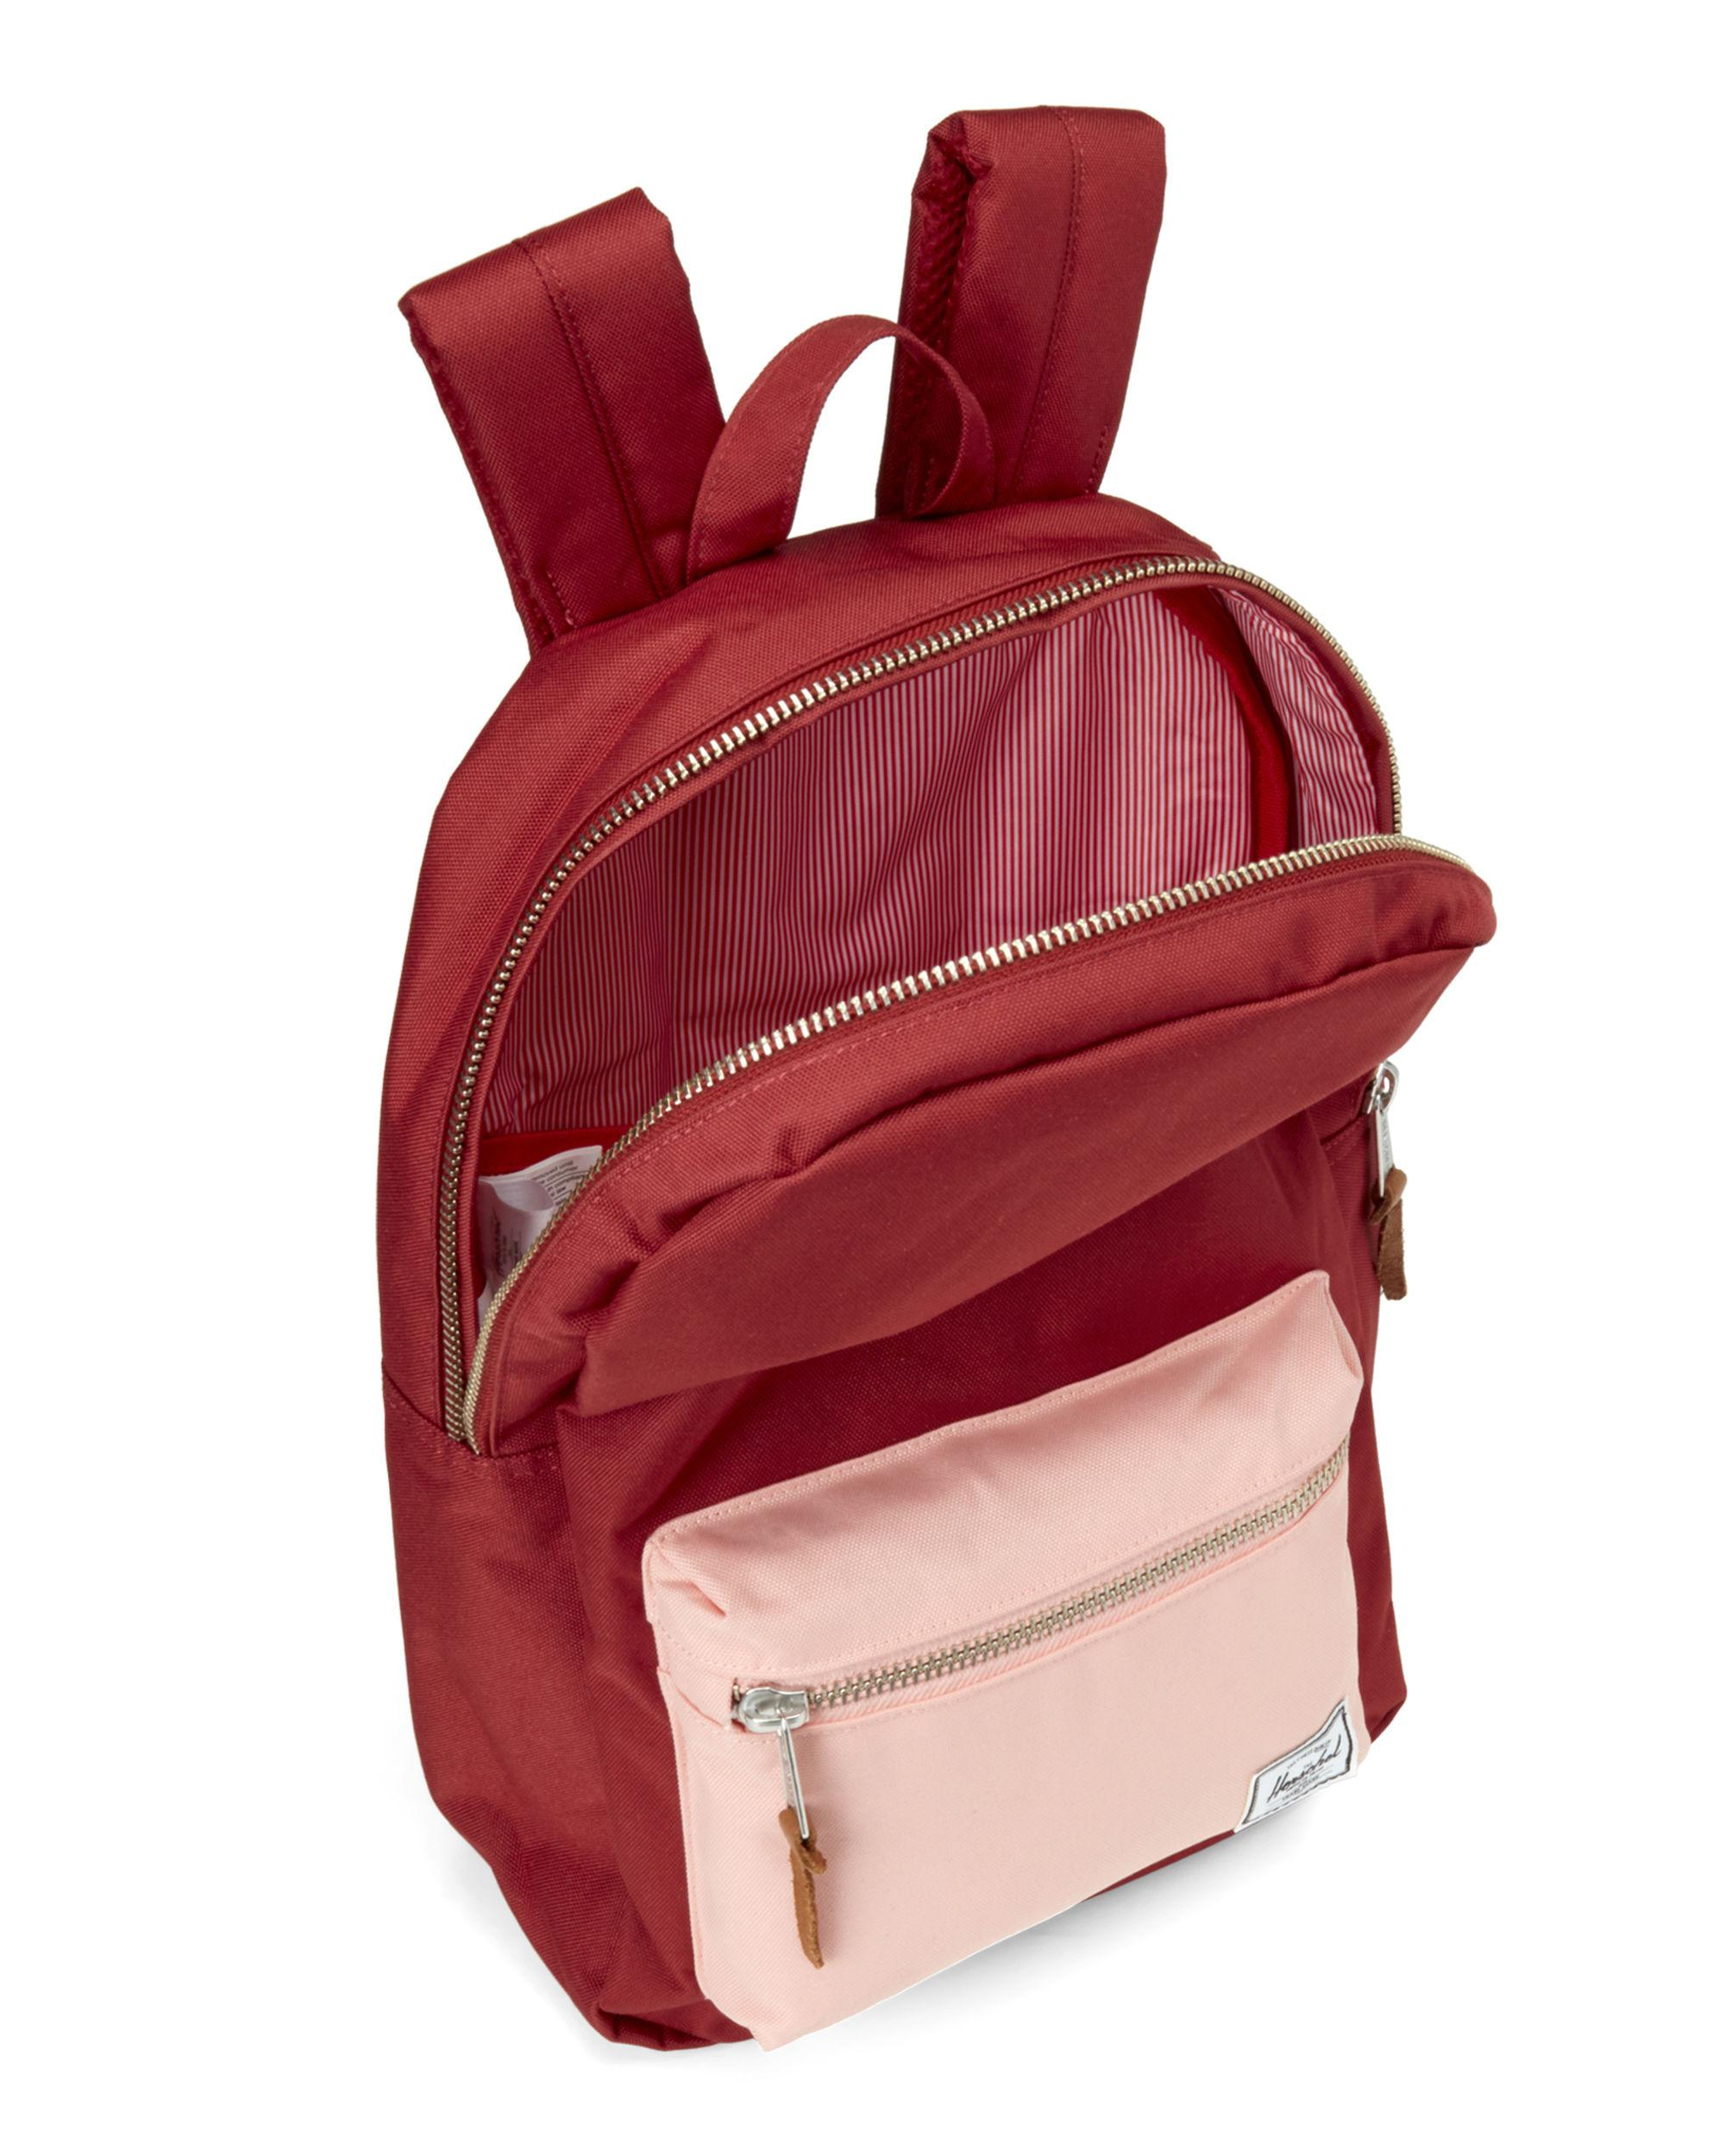 e10506d7e79 Lyst - Herschel Supply Co. Brick Peach Settlement Mid Backpack in Red for  Men